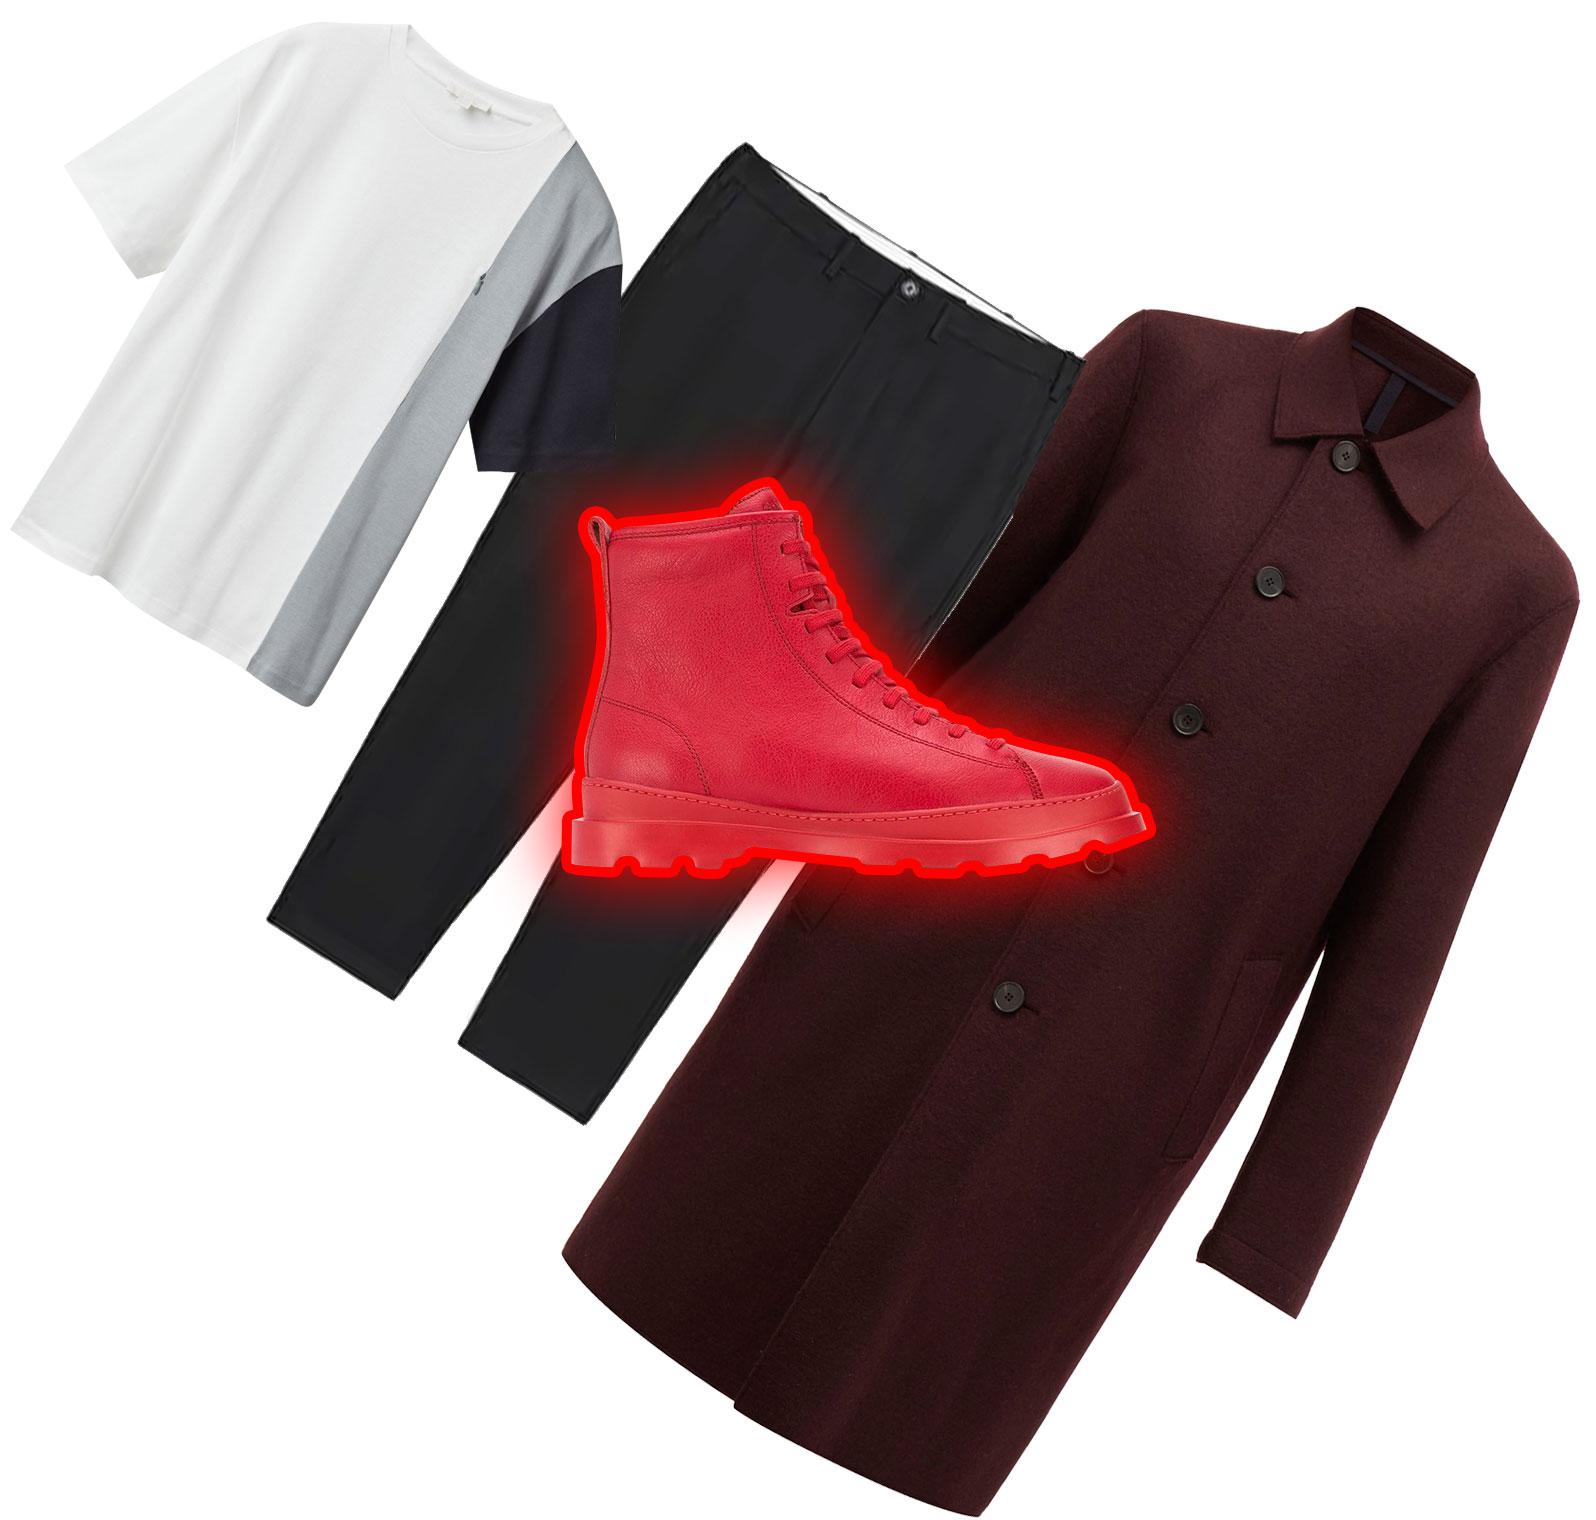 Пальто Harris Wharf London, €265; футболка COS, €45; брюки Arket, $119; обувь Champer, 14500 рублей